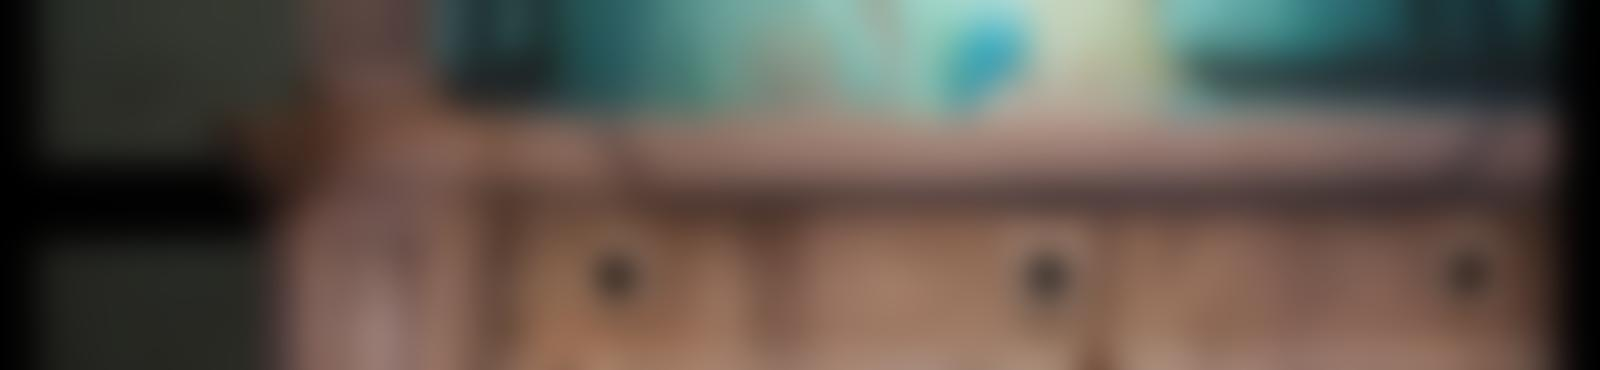 Blurred 5e3c5920 46ab 453d 98f4 510514346fae